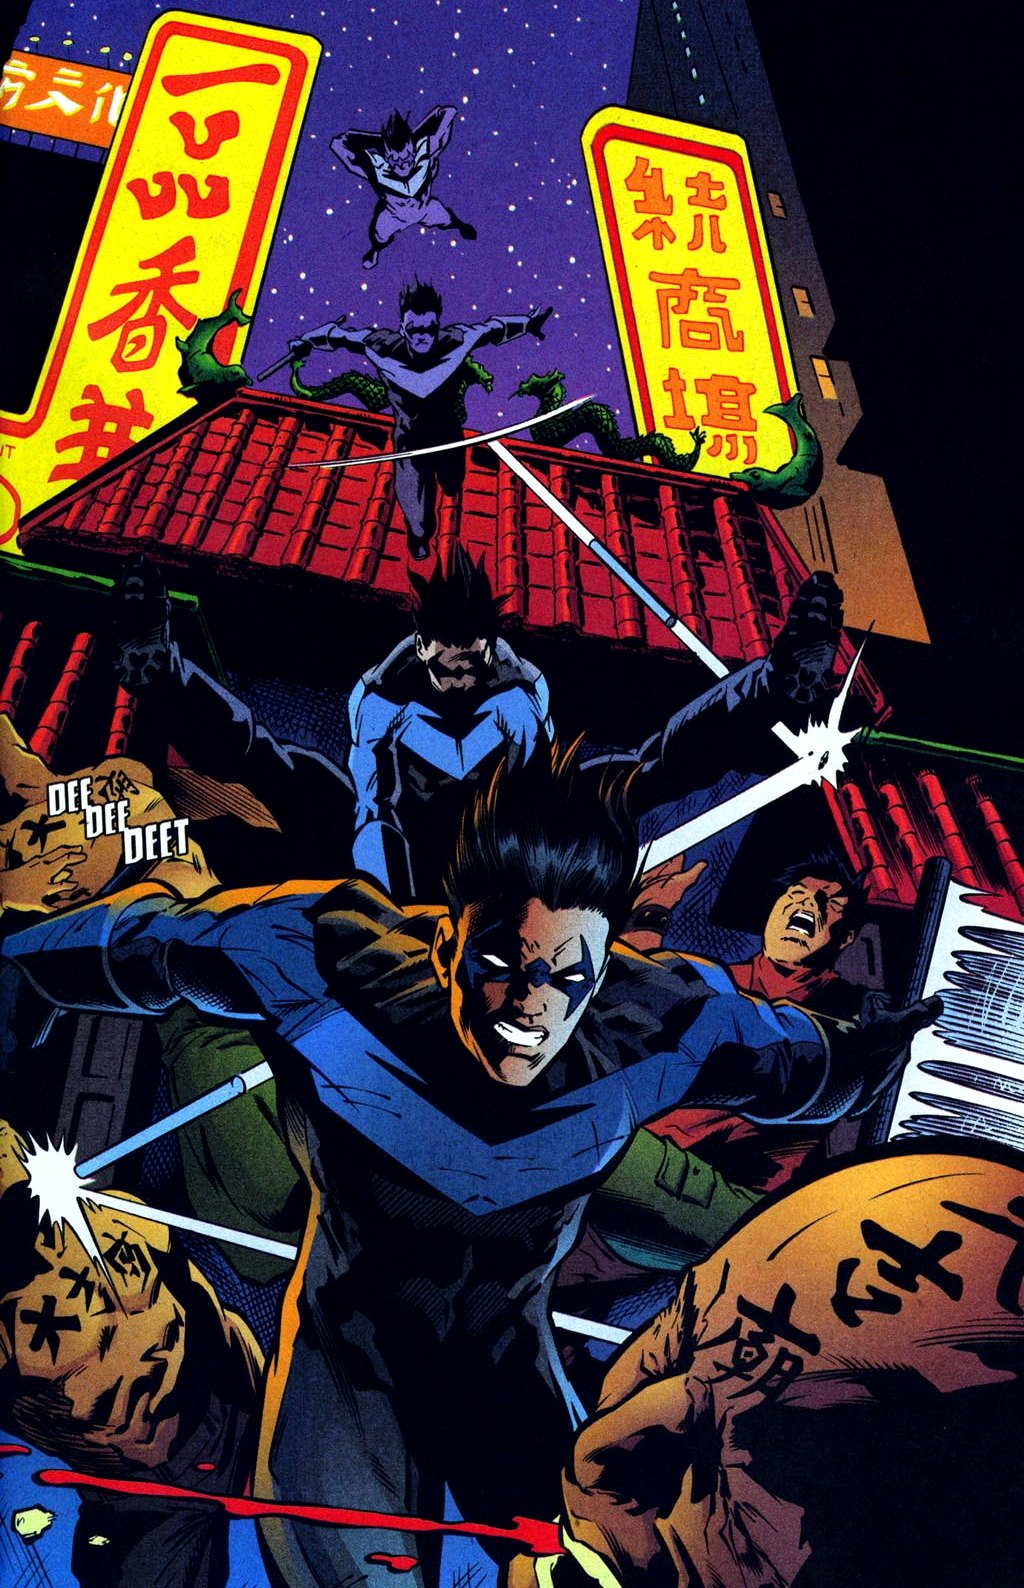 Nightwing 0090.jpg